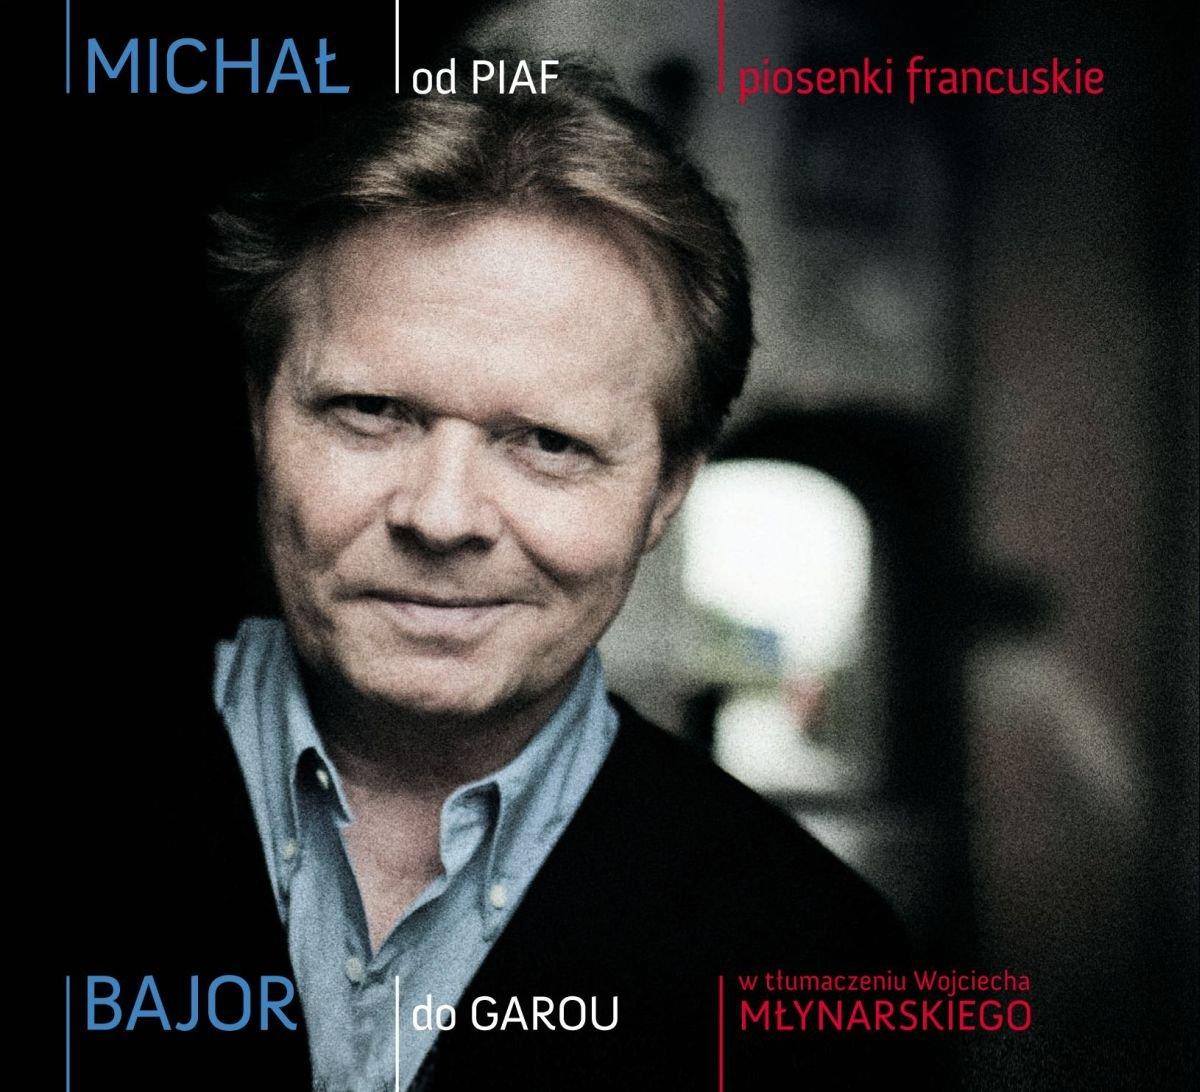 BAJOR MICHAŁ – Od Piaf Do Garou